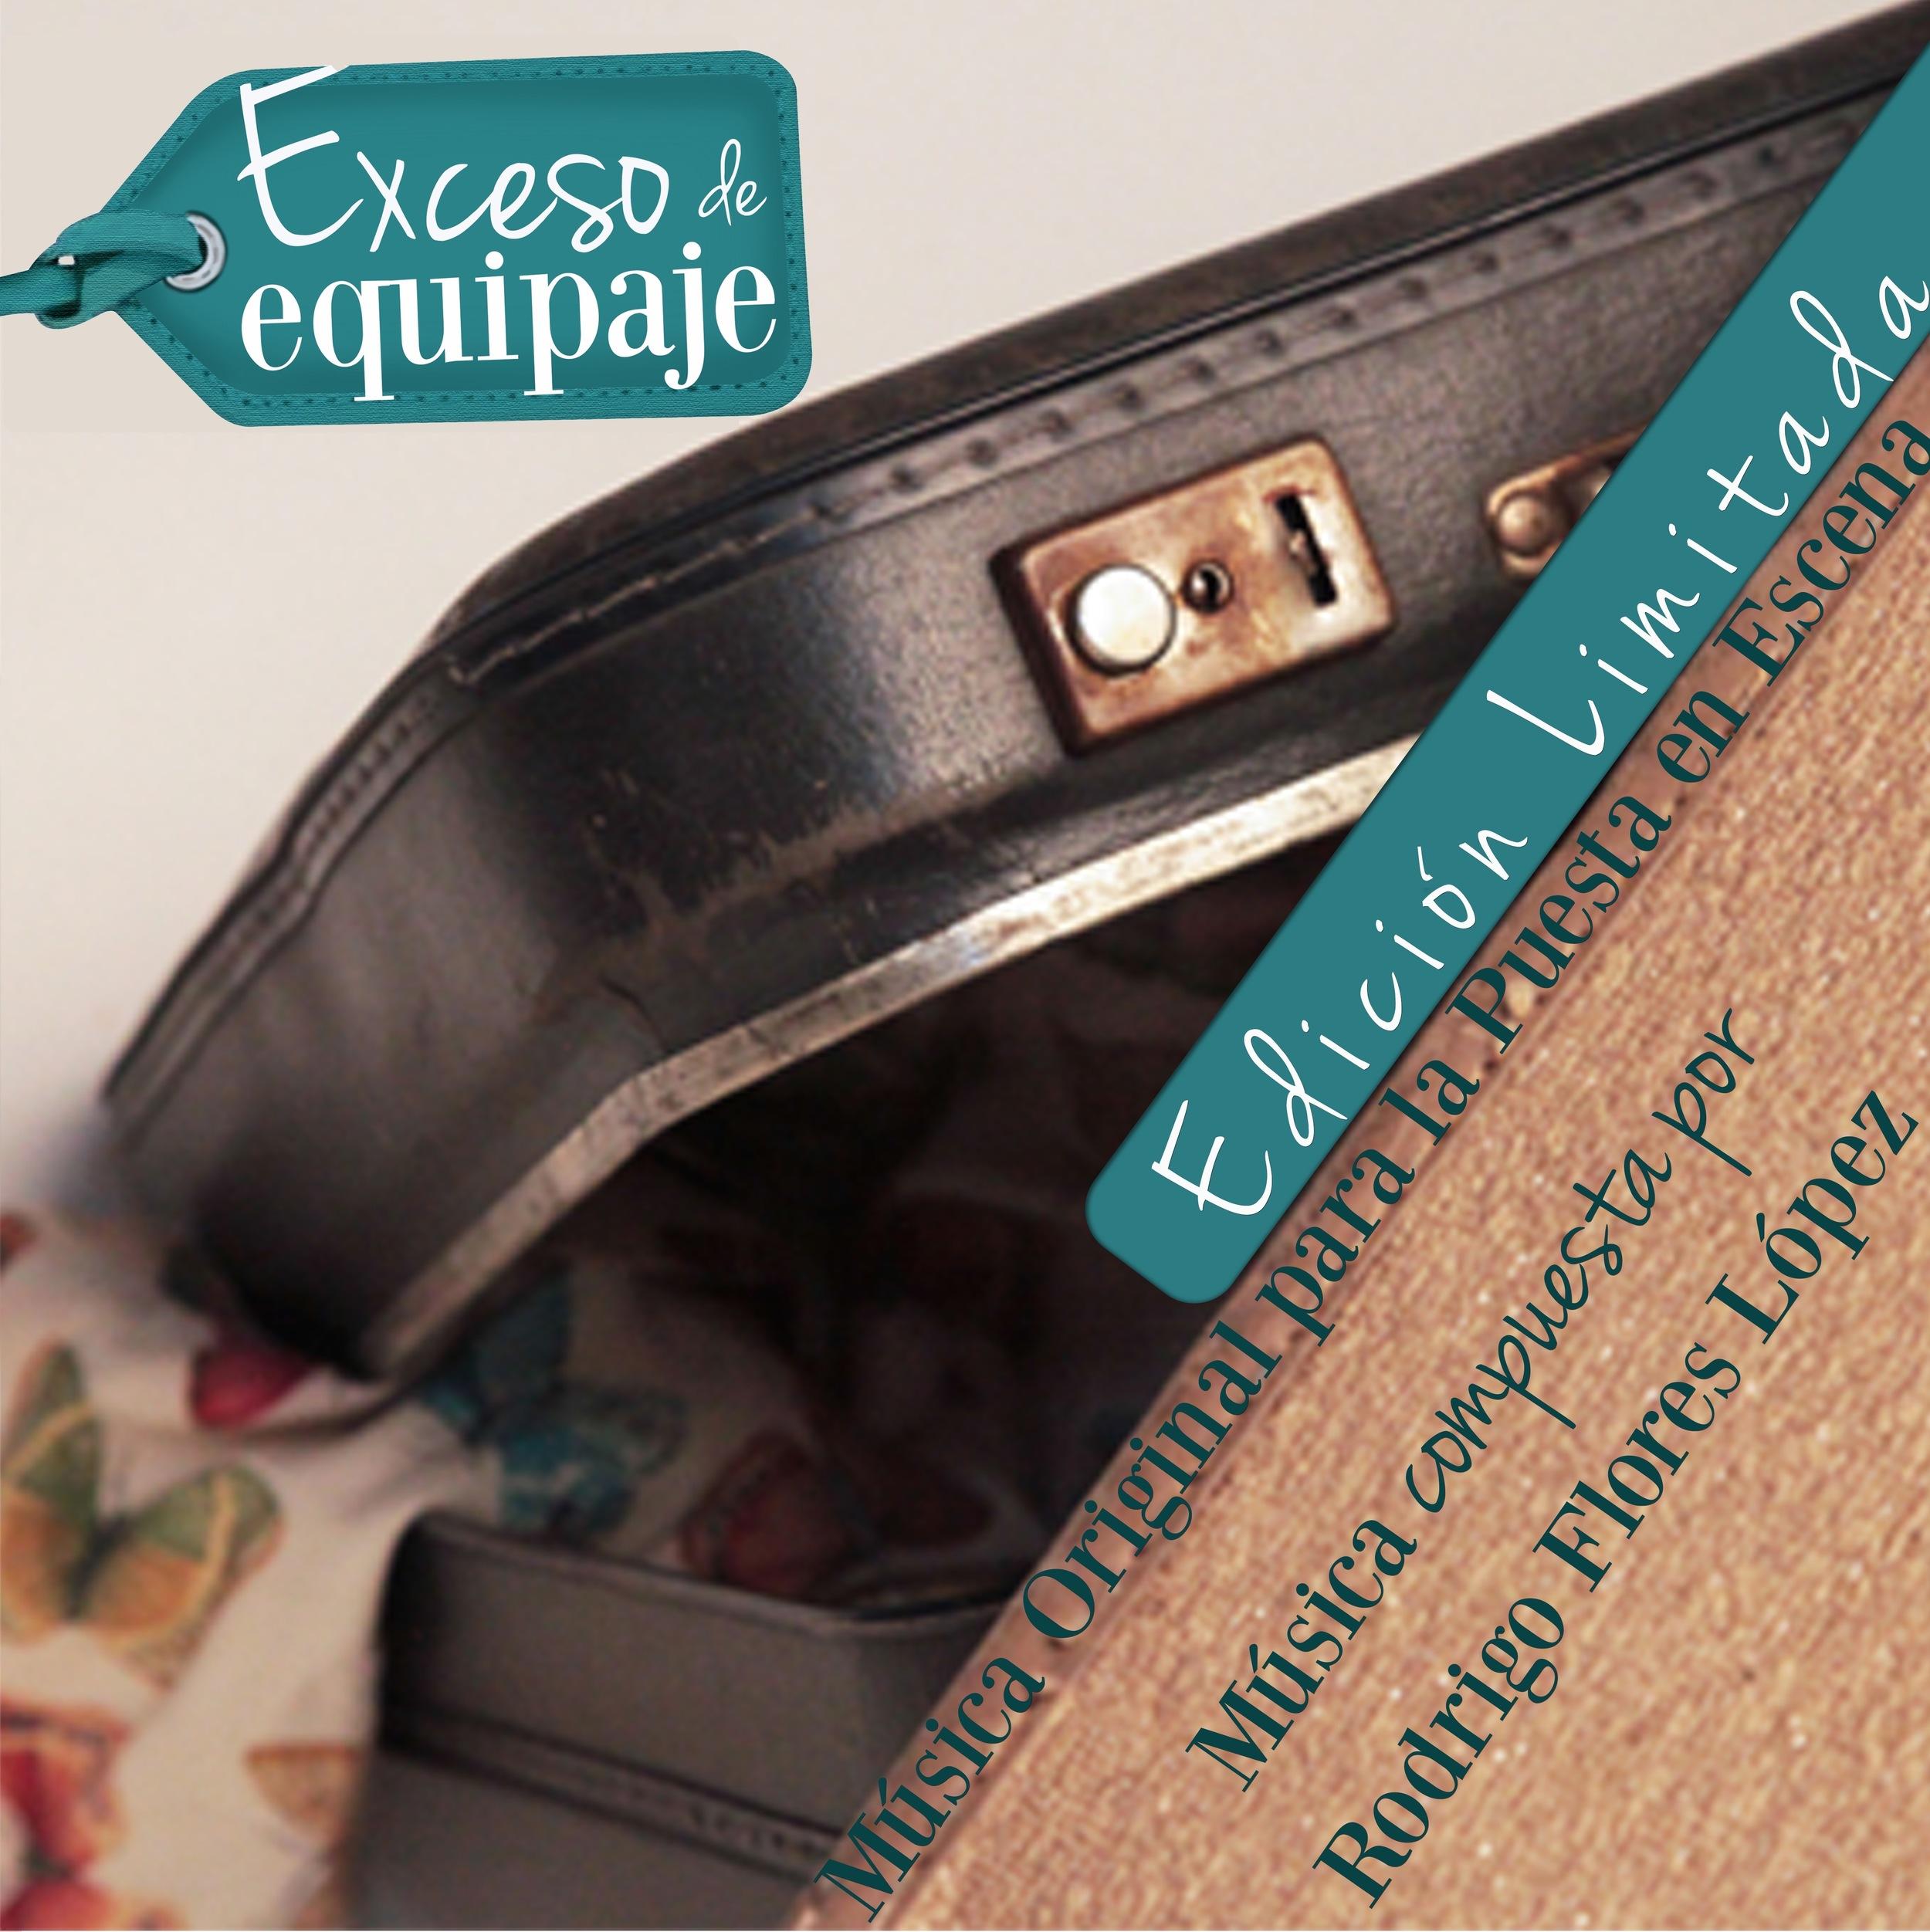 Exceso de Equipaje  Original Score (Limited Edition)